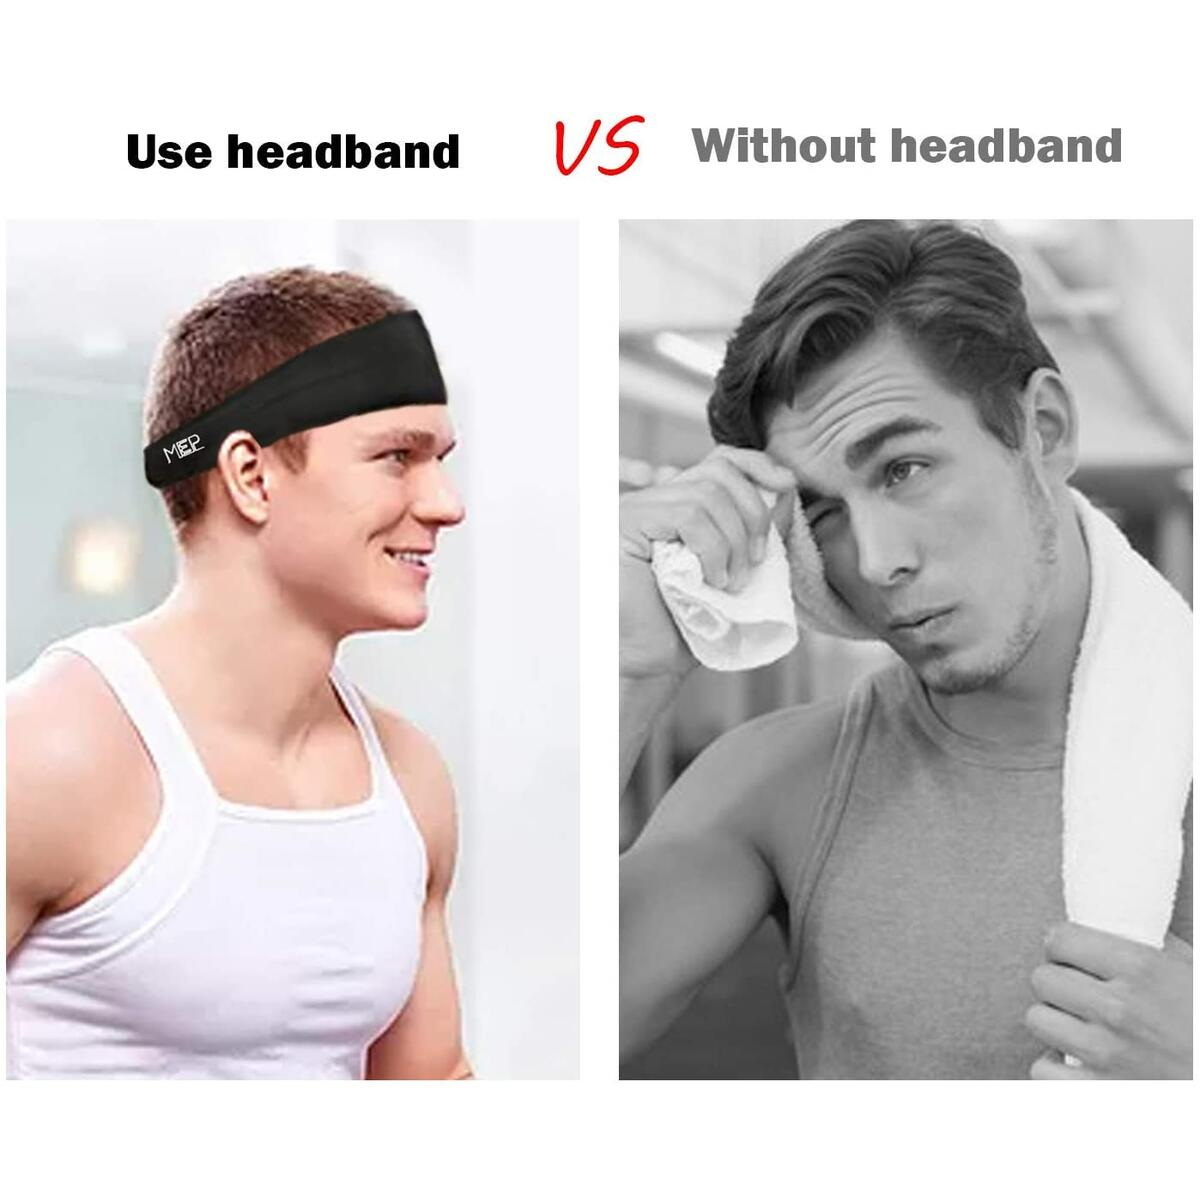 Mepakl Mens Headband Sweatband (4 Pack) - Stretchy Wide Sports Headband for Workout, Running, Yoga, Football, Tennis, Basketball - Athletic Sweat Head Bands Unisex